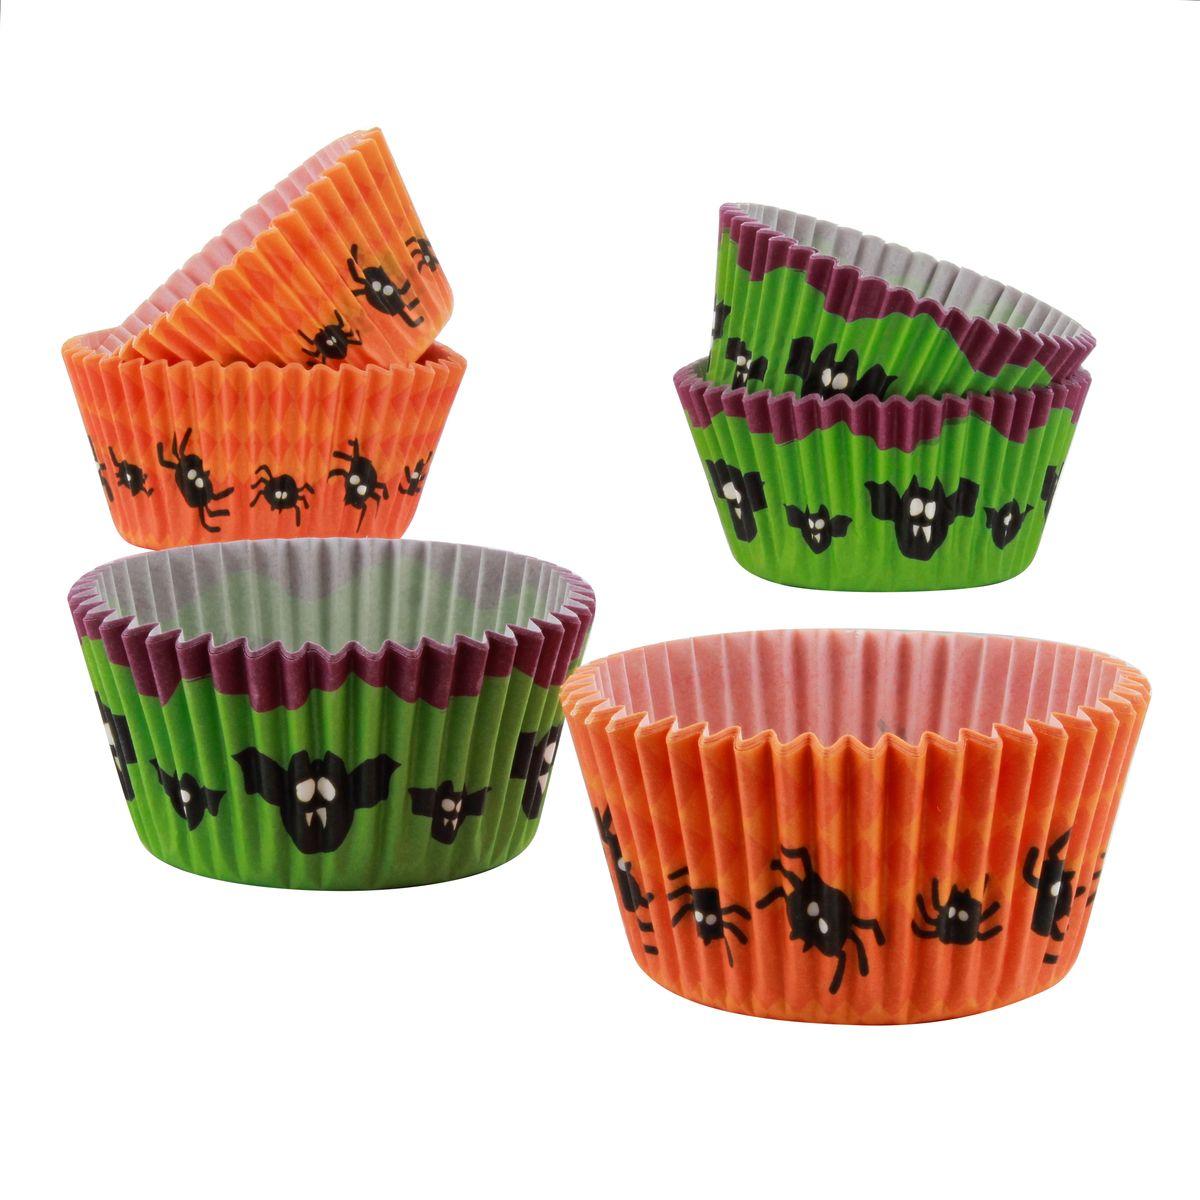 48 caissettes à muffins Halloween vert et orange 7 cm - Birkmann